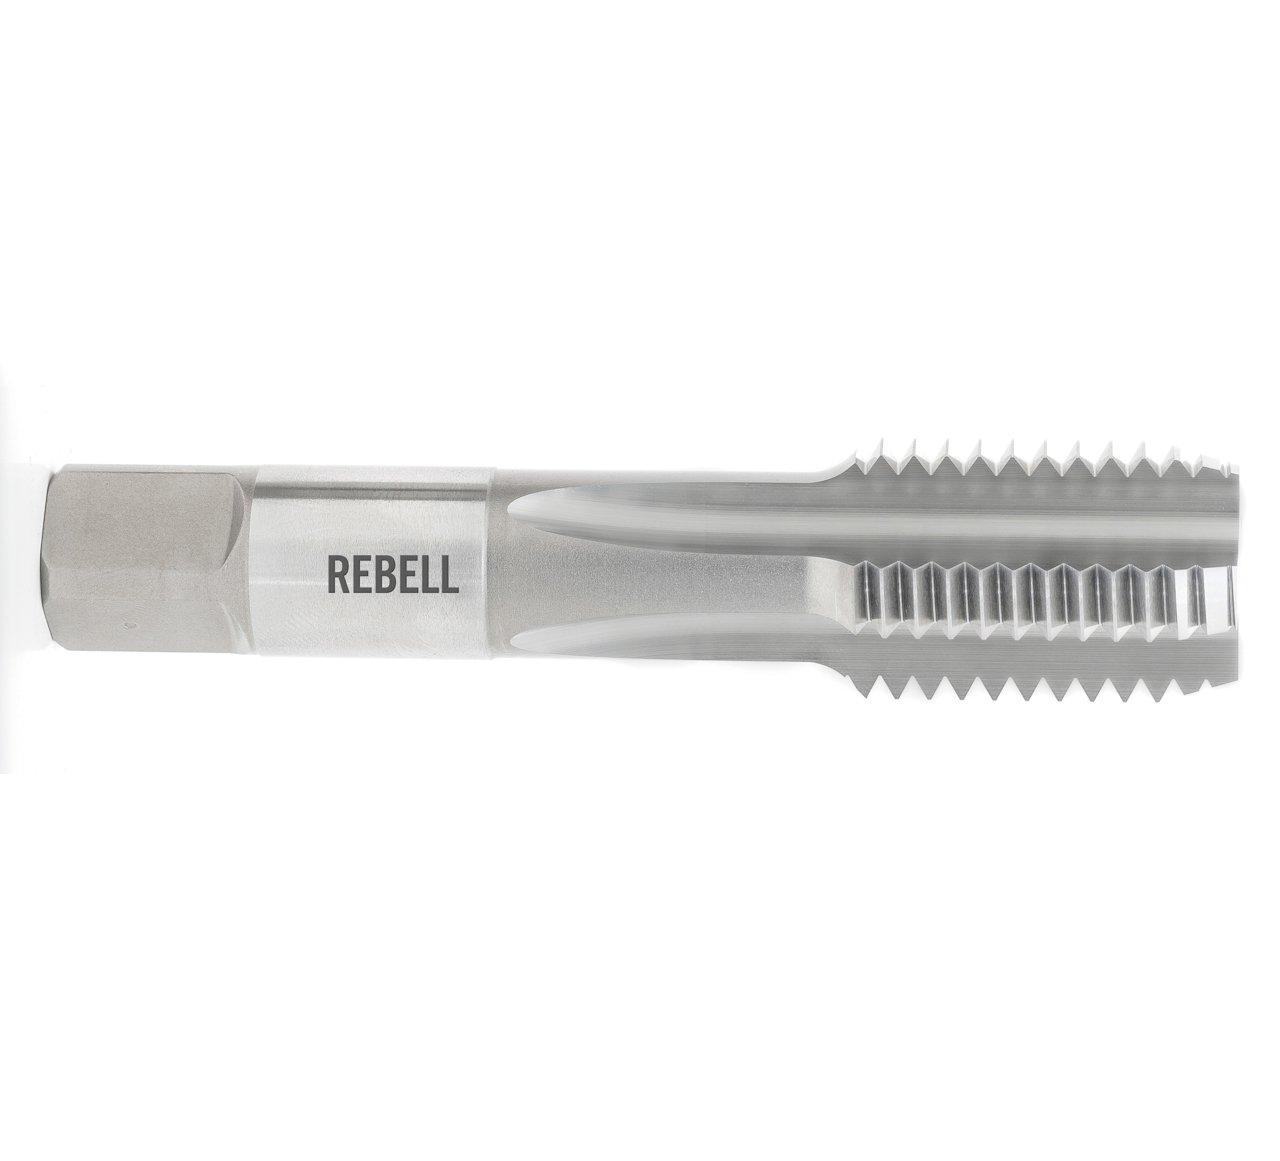 REBELL Einschnittgewindebohrer EG-BA RH medium mod. HSS - Form D gerade genutet - ISO 529 - Typ N